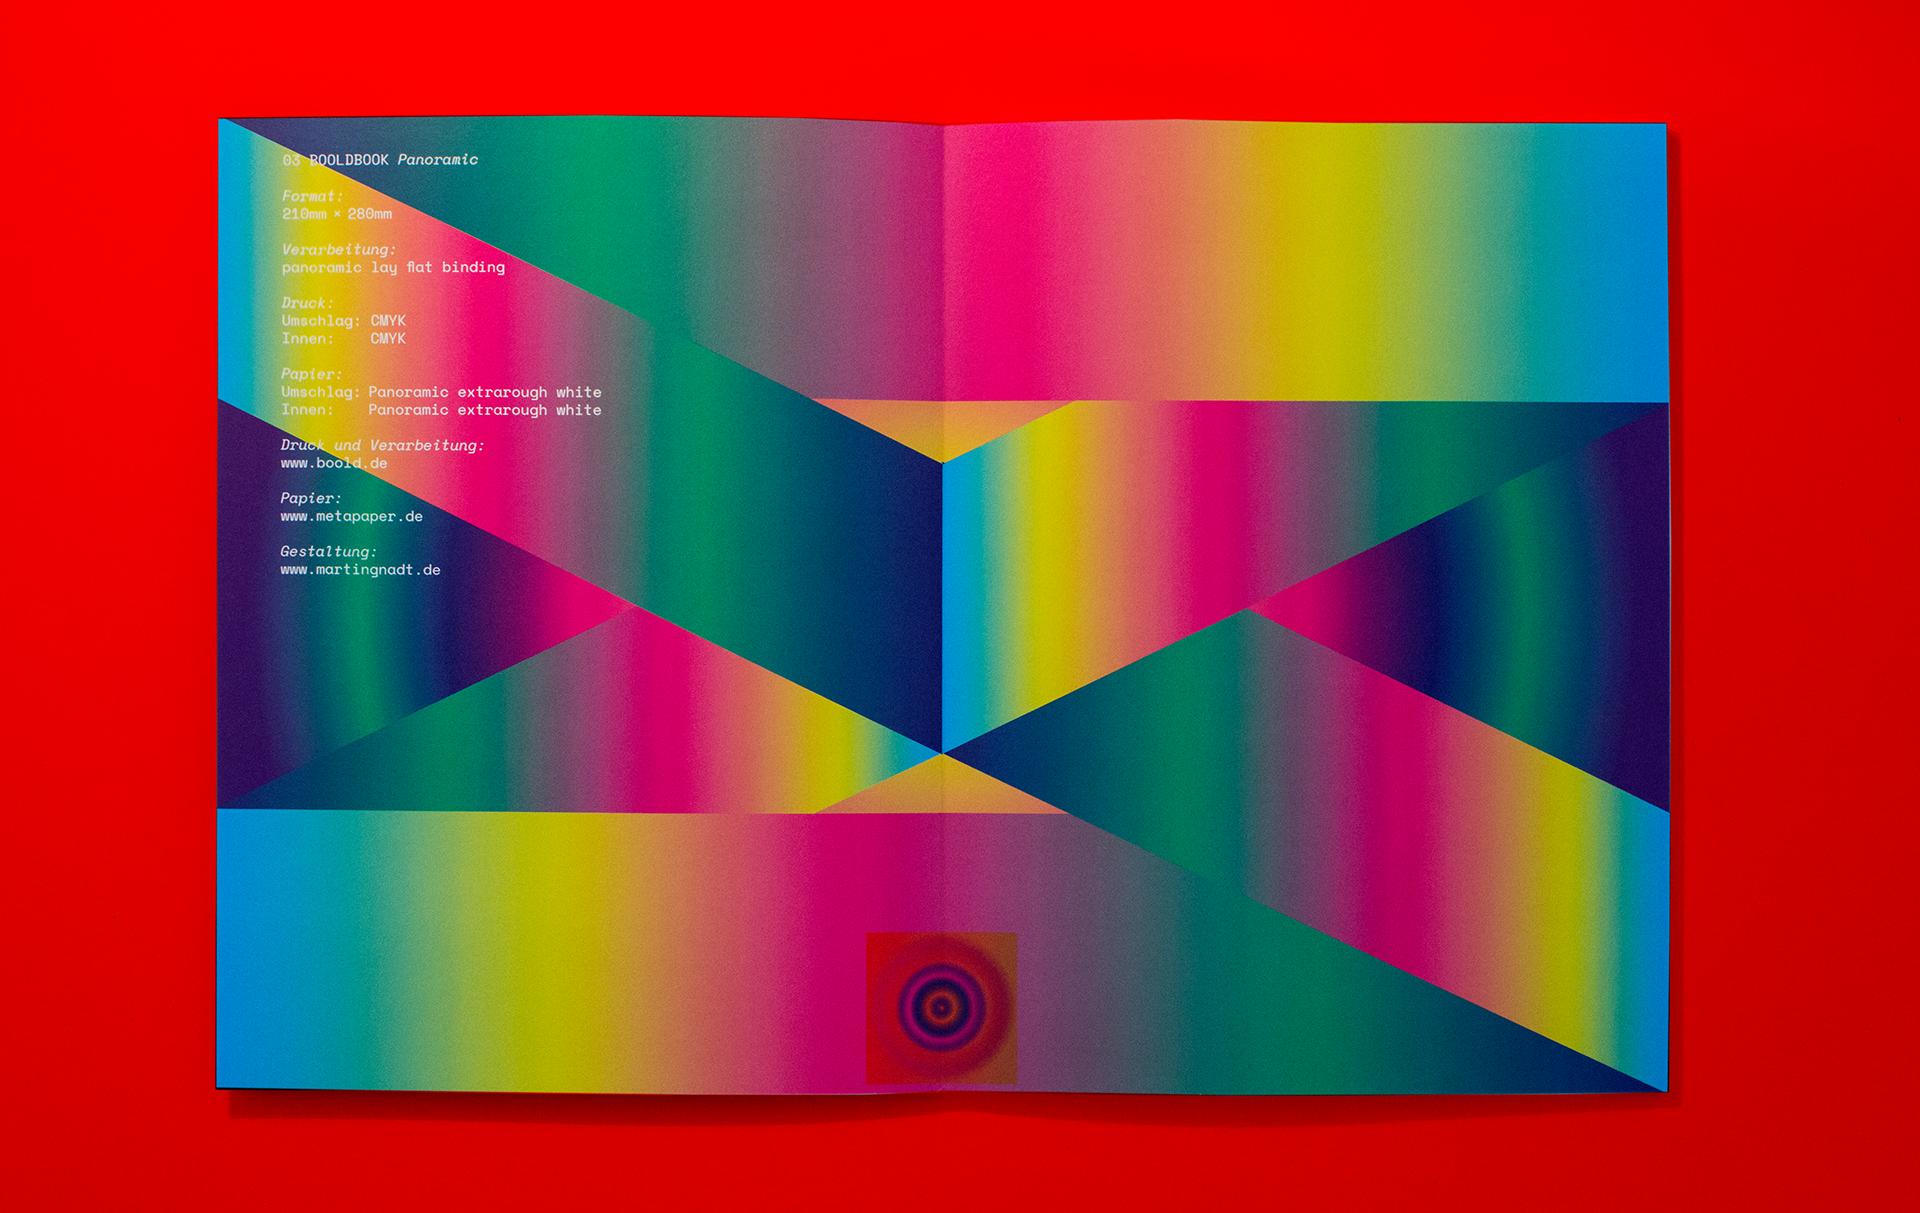 Martin Gnadt — Kommunikationsdesign BOOLD notebooks